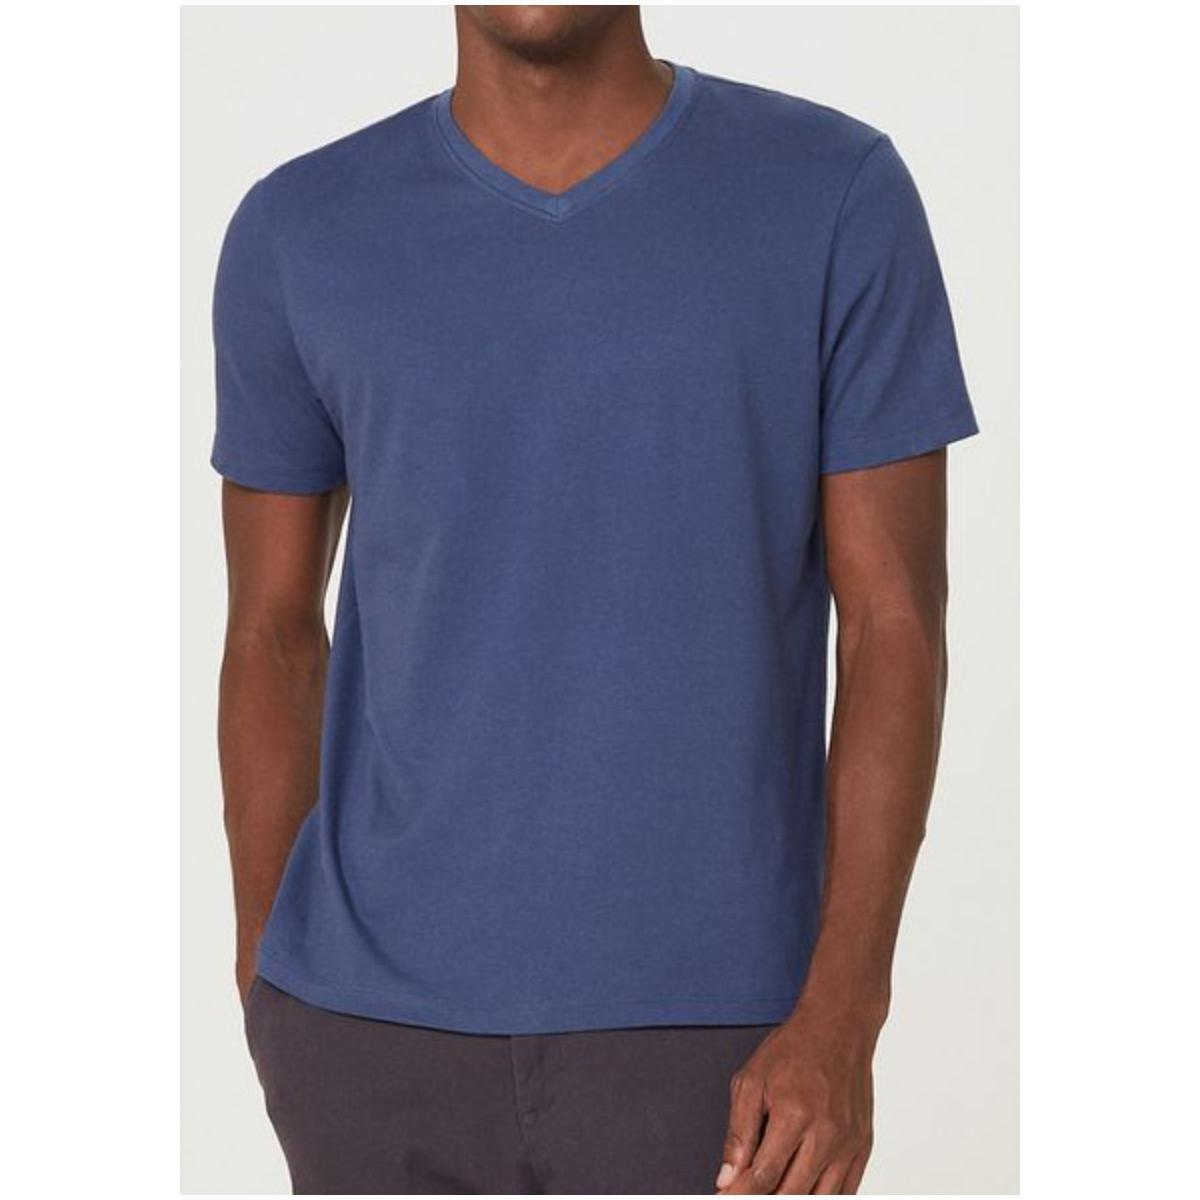 Camiseta Masculina Hering 022b Az2en Azul Escuro